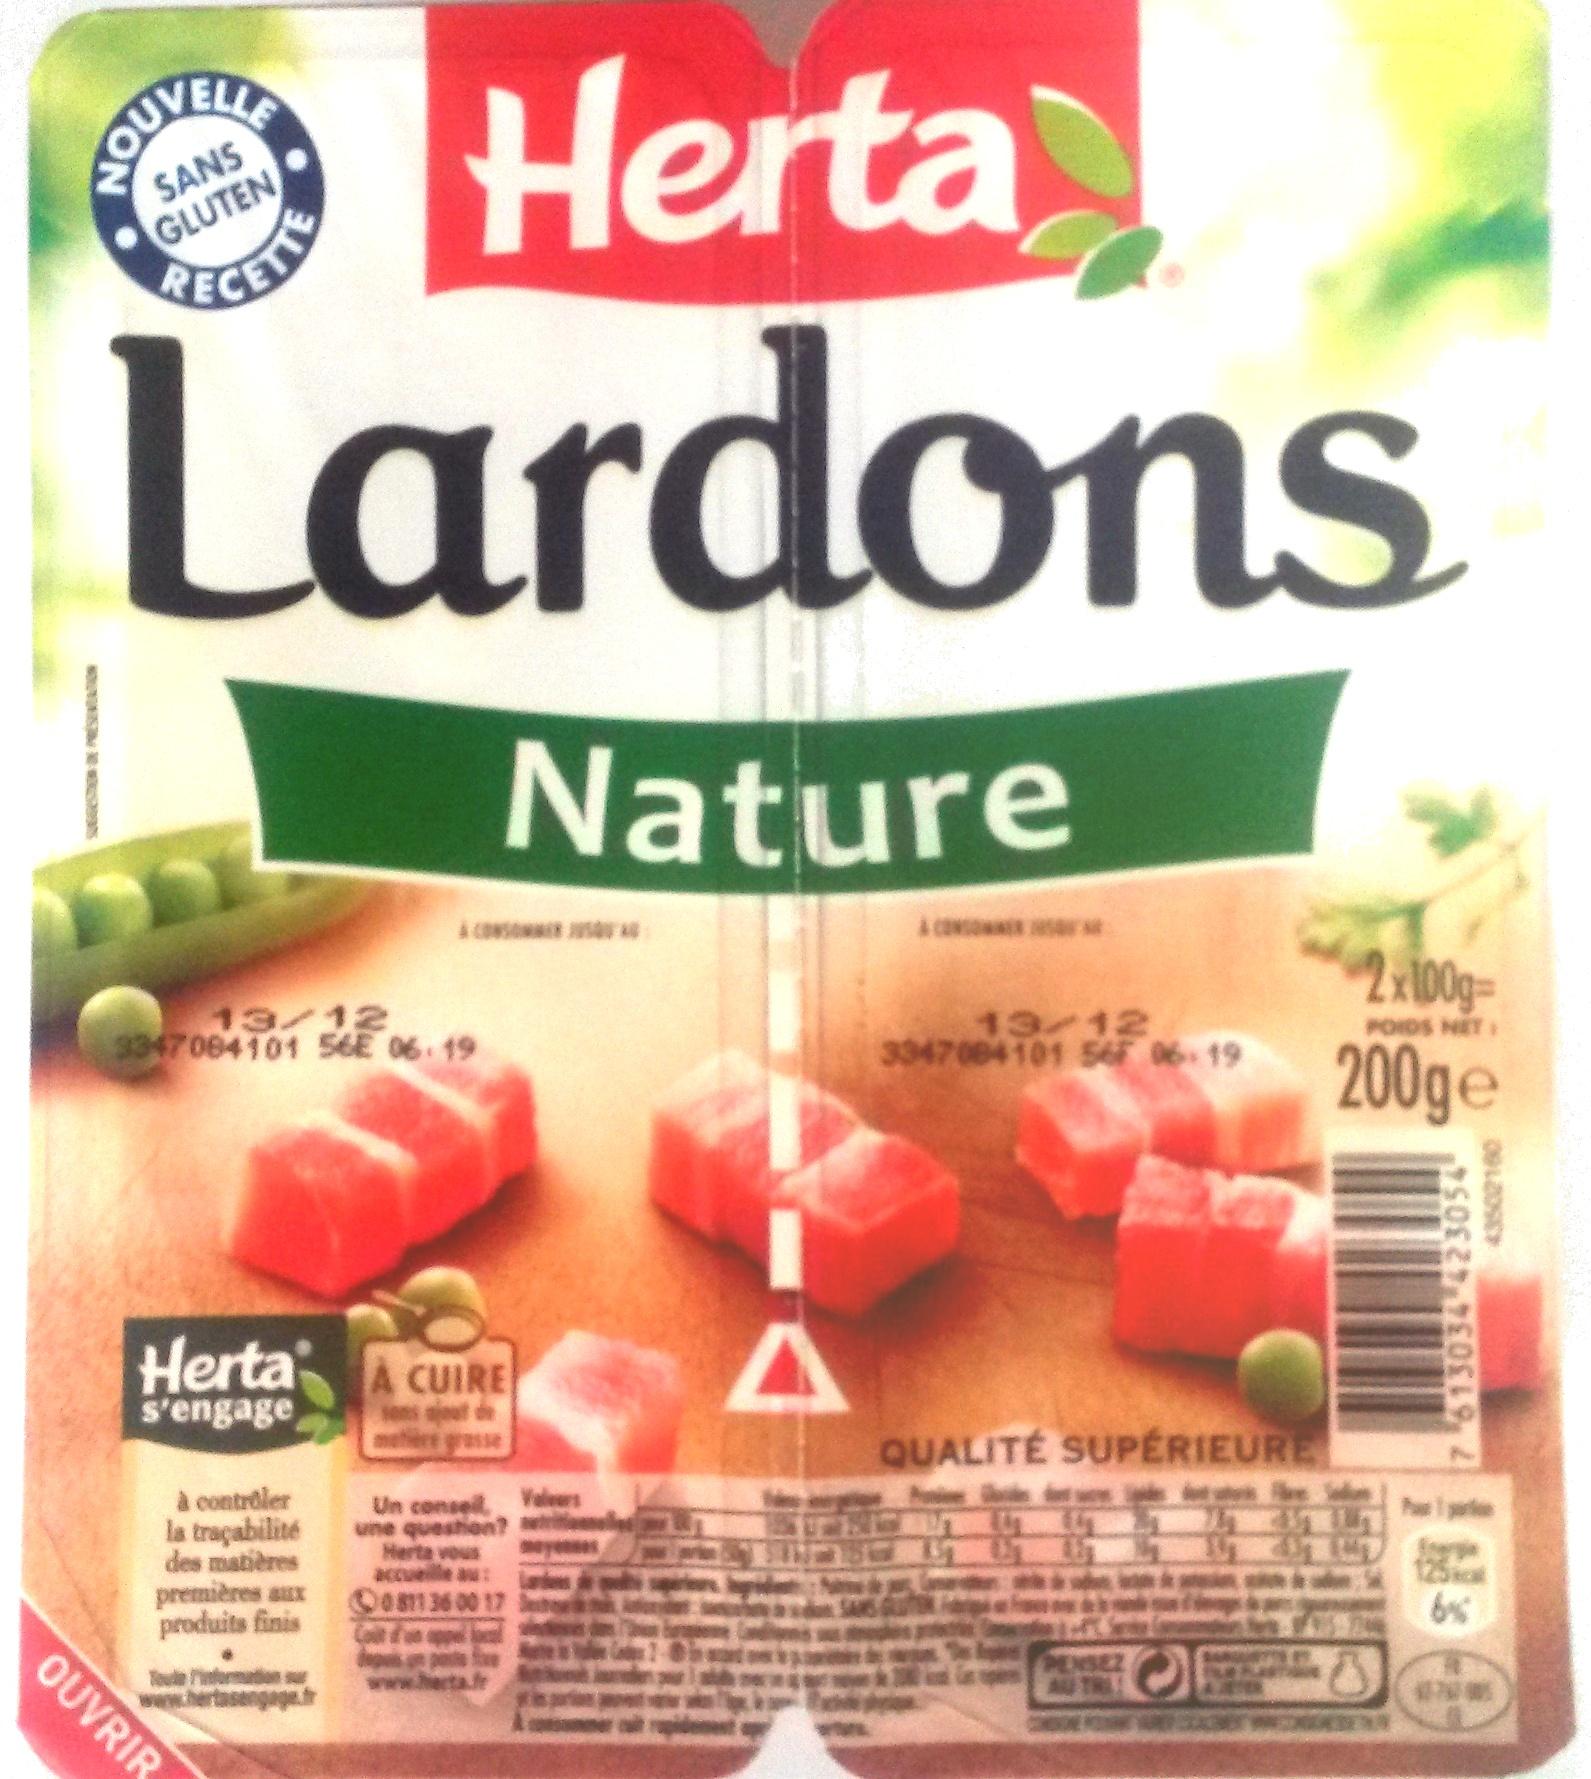 Lardons, Nature - Product - fr